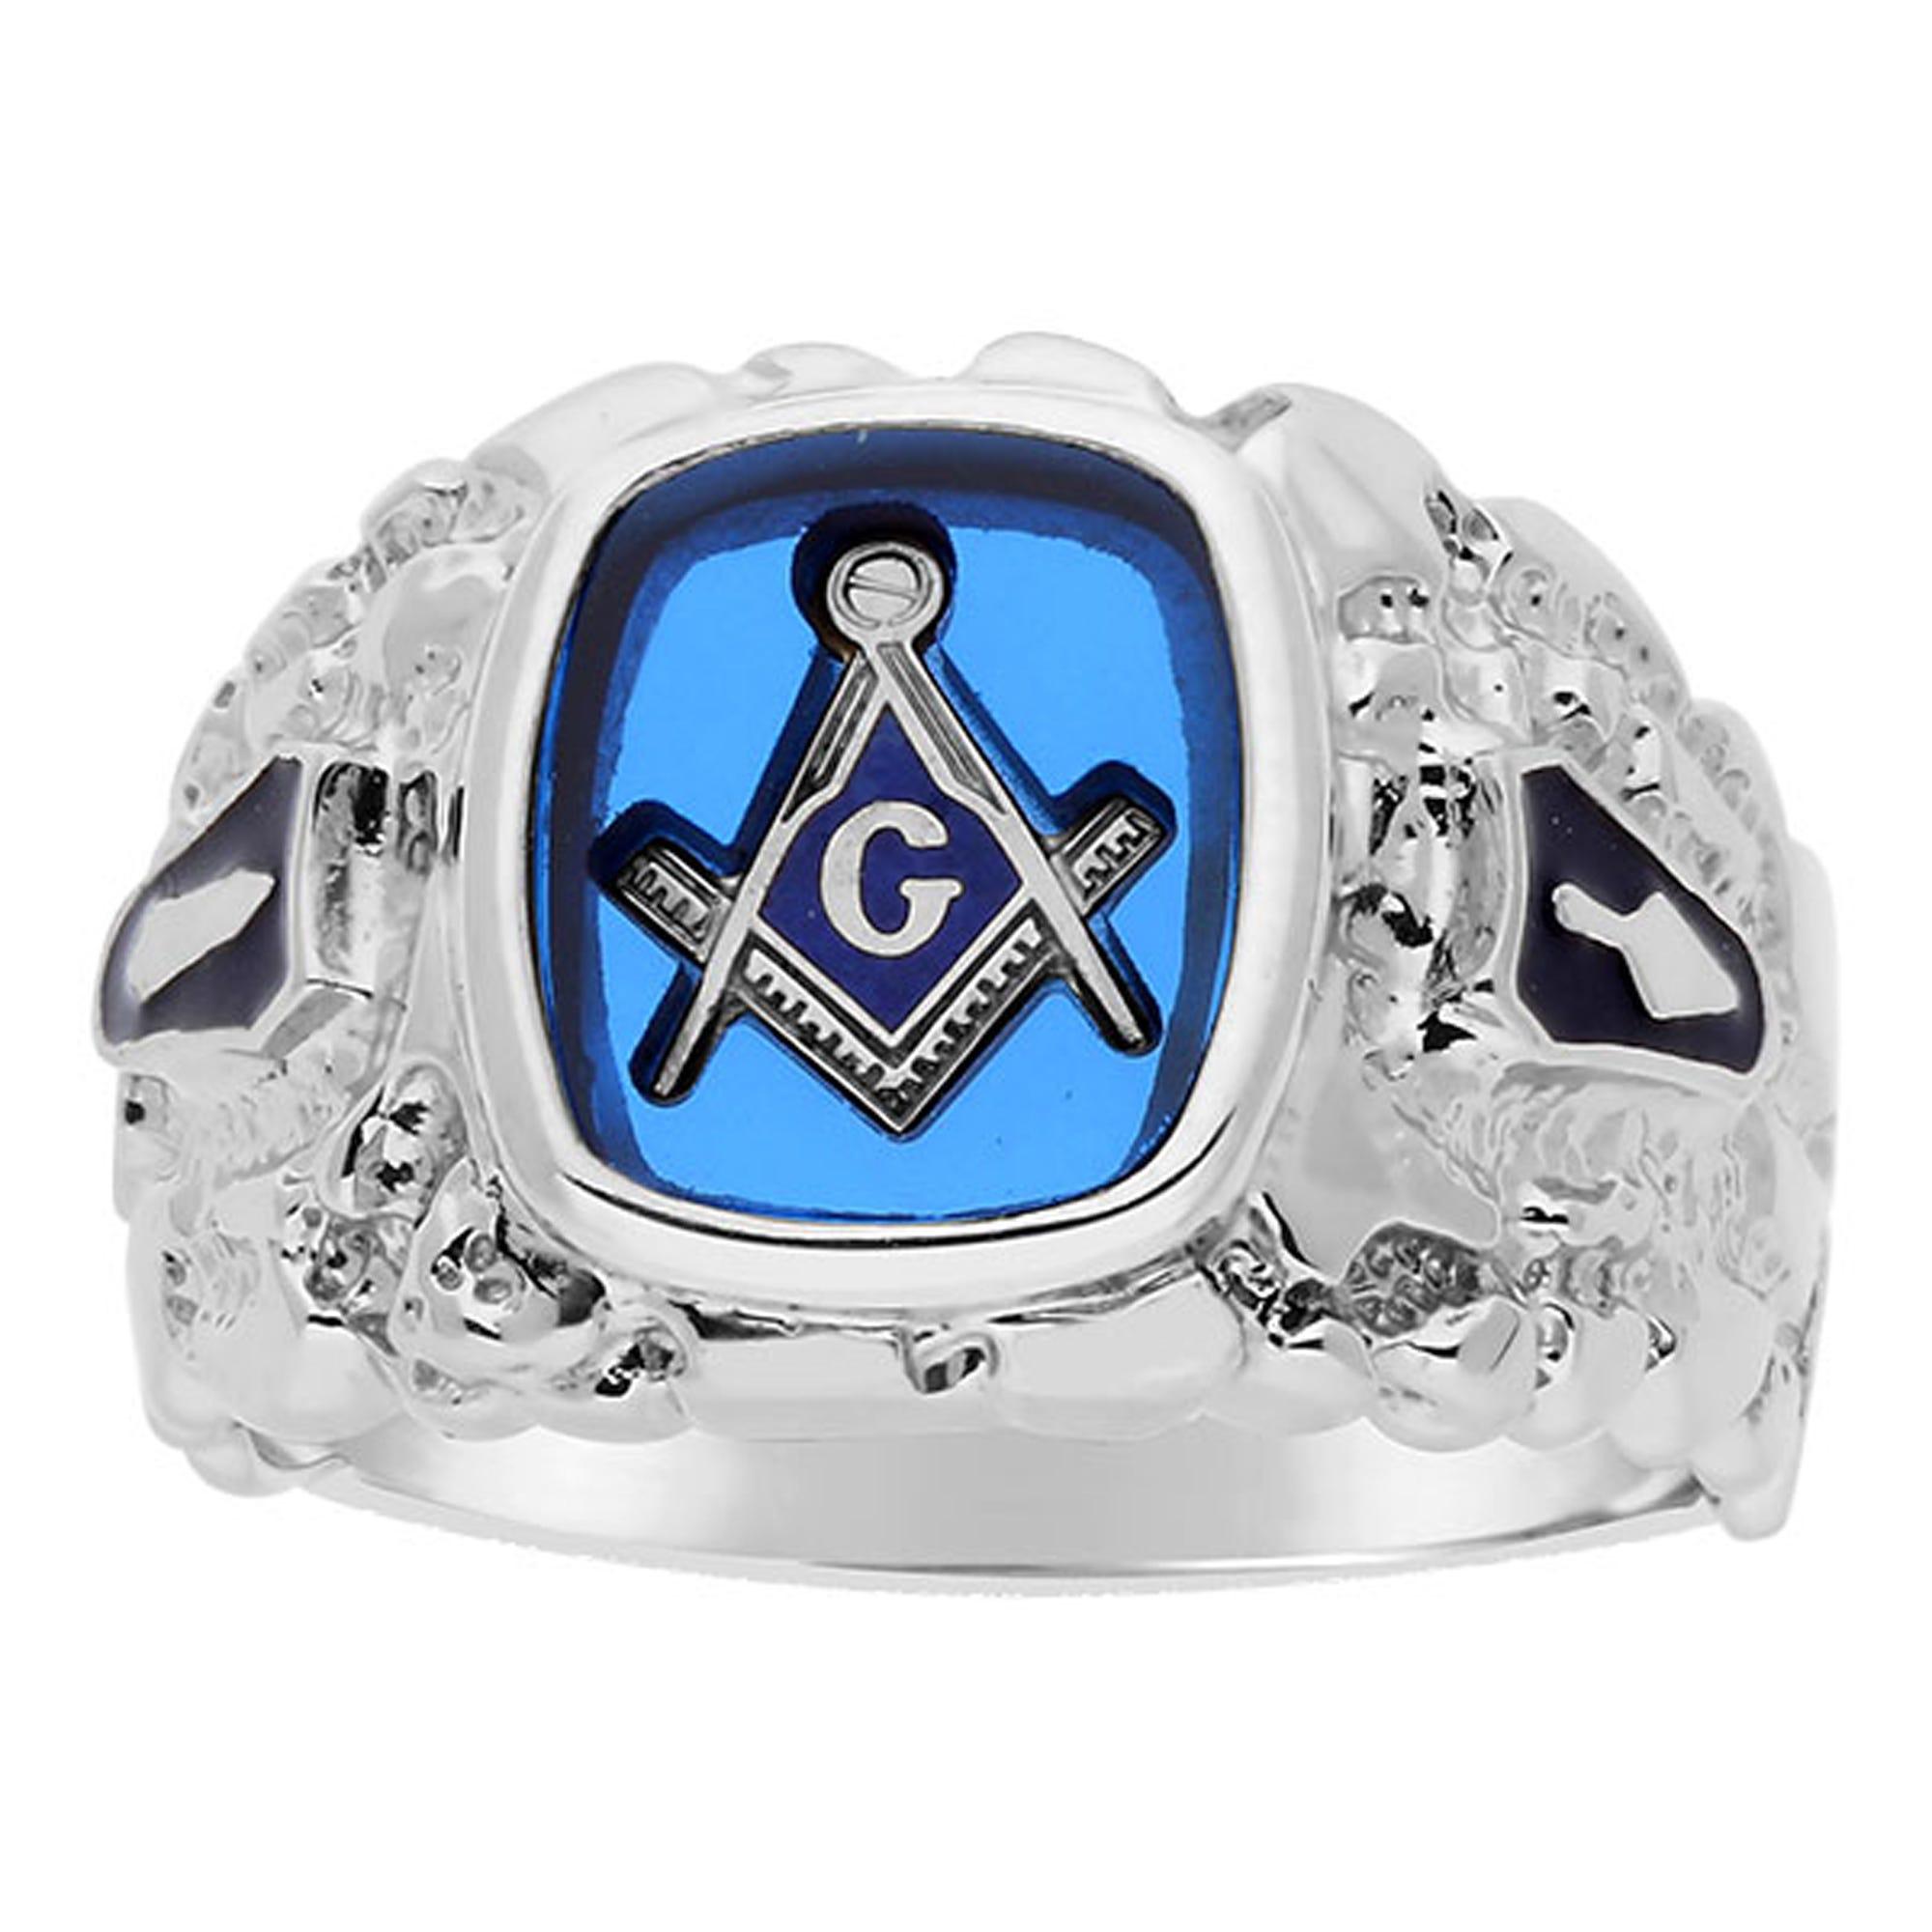 IBGoodman Men's Blue Spinel Masonic Ring in Sterling Silver